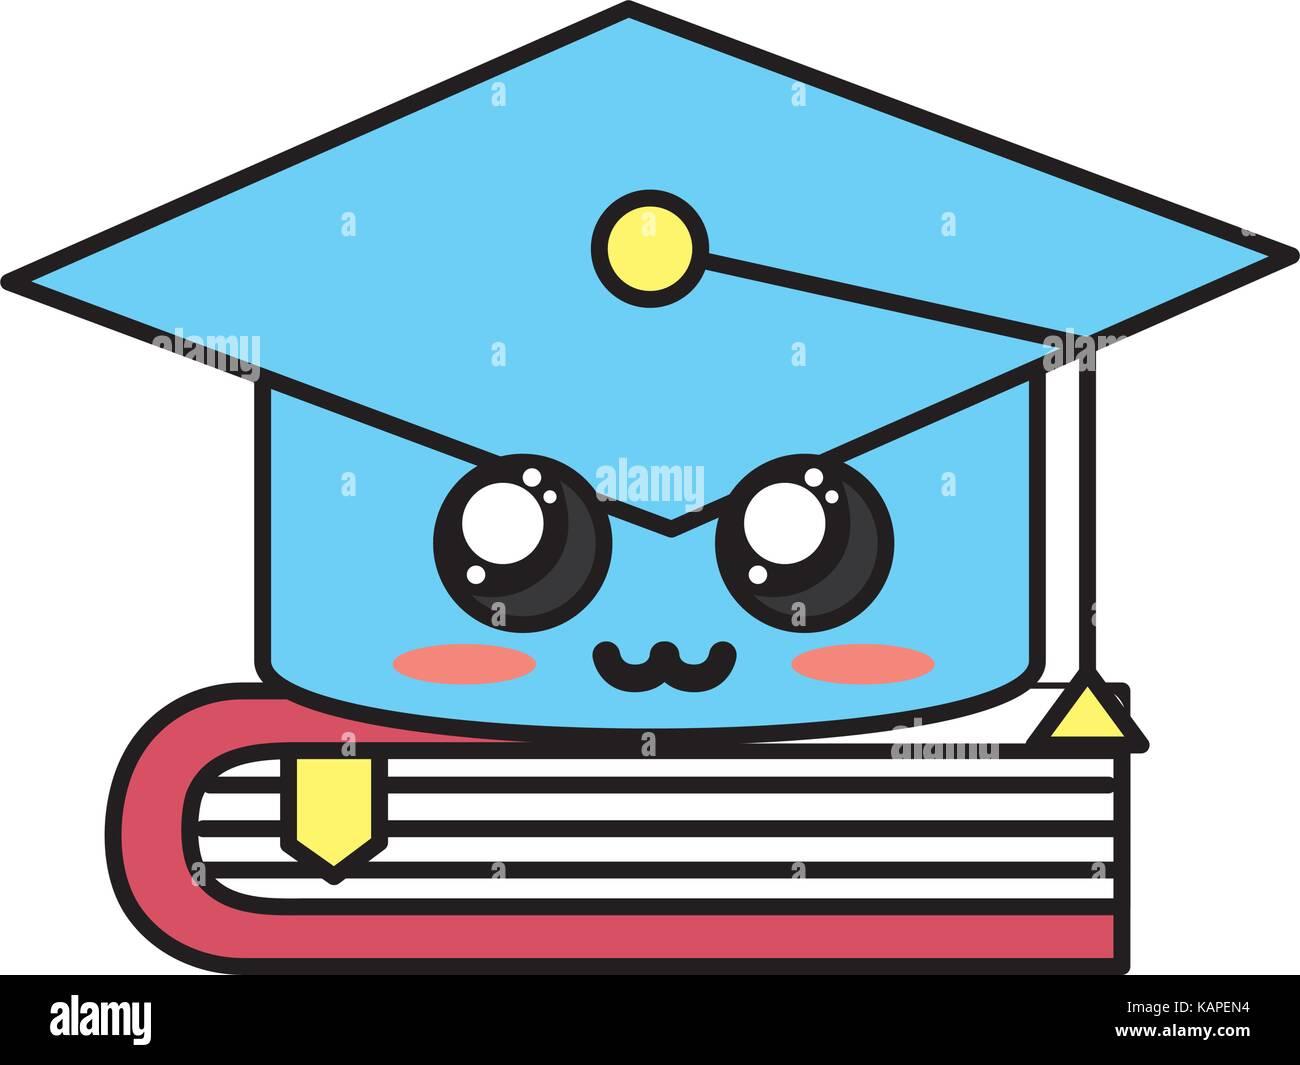 Kawaii Cute Offre Plus De Diplomes Cap Livre Fermer Vecteurs